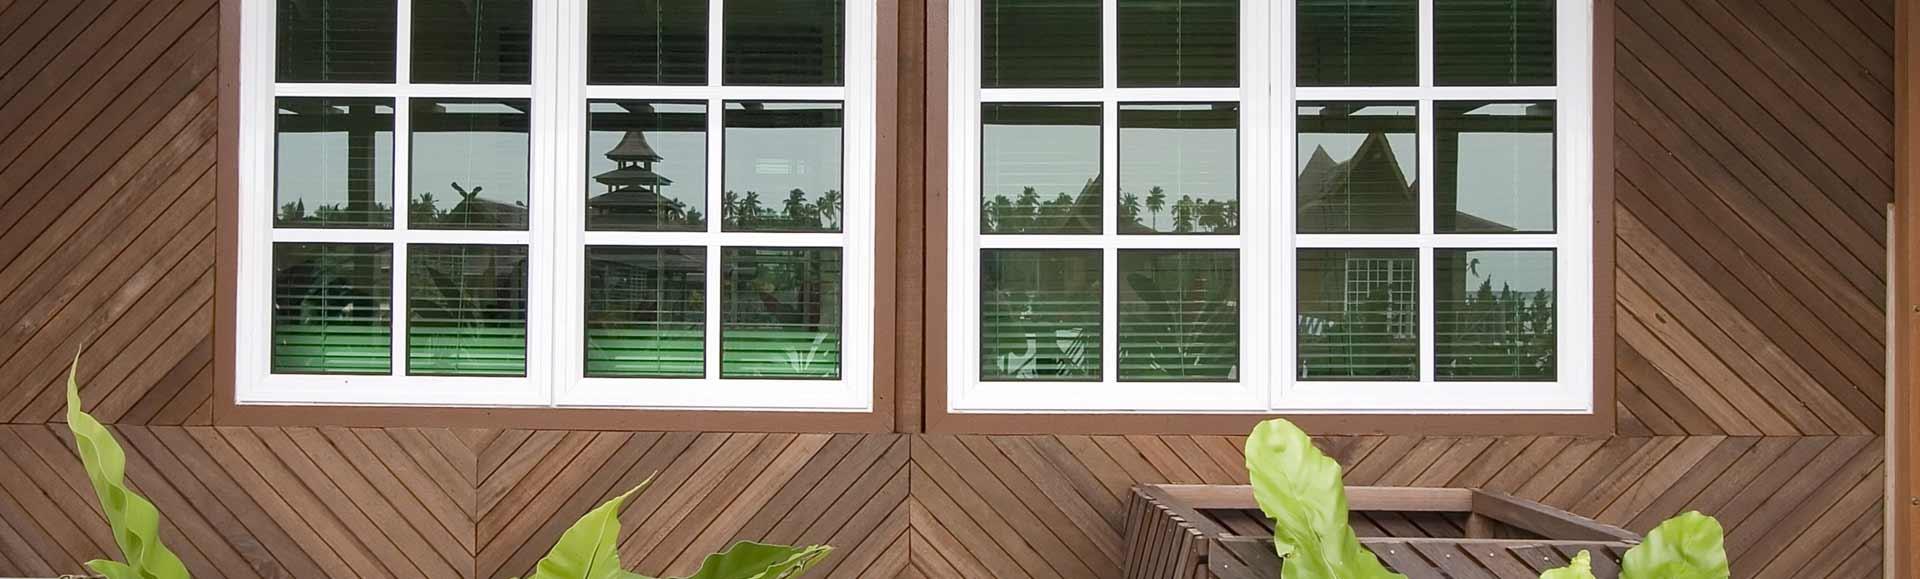 Lumber Yard, Decking and Windows and Doors